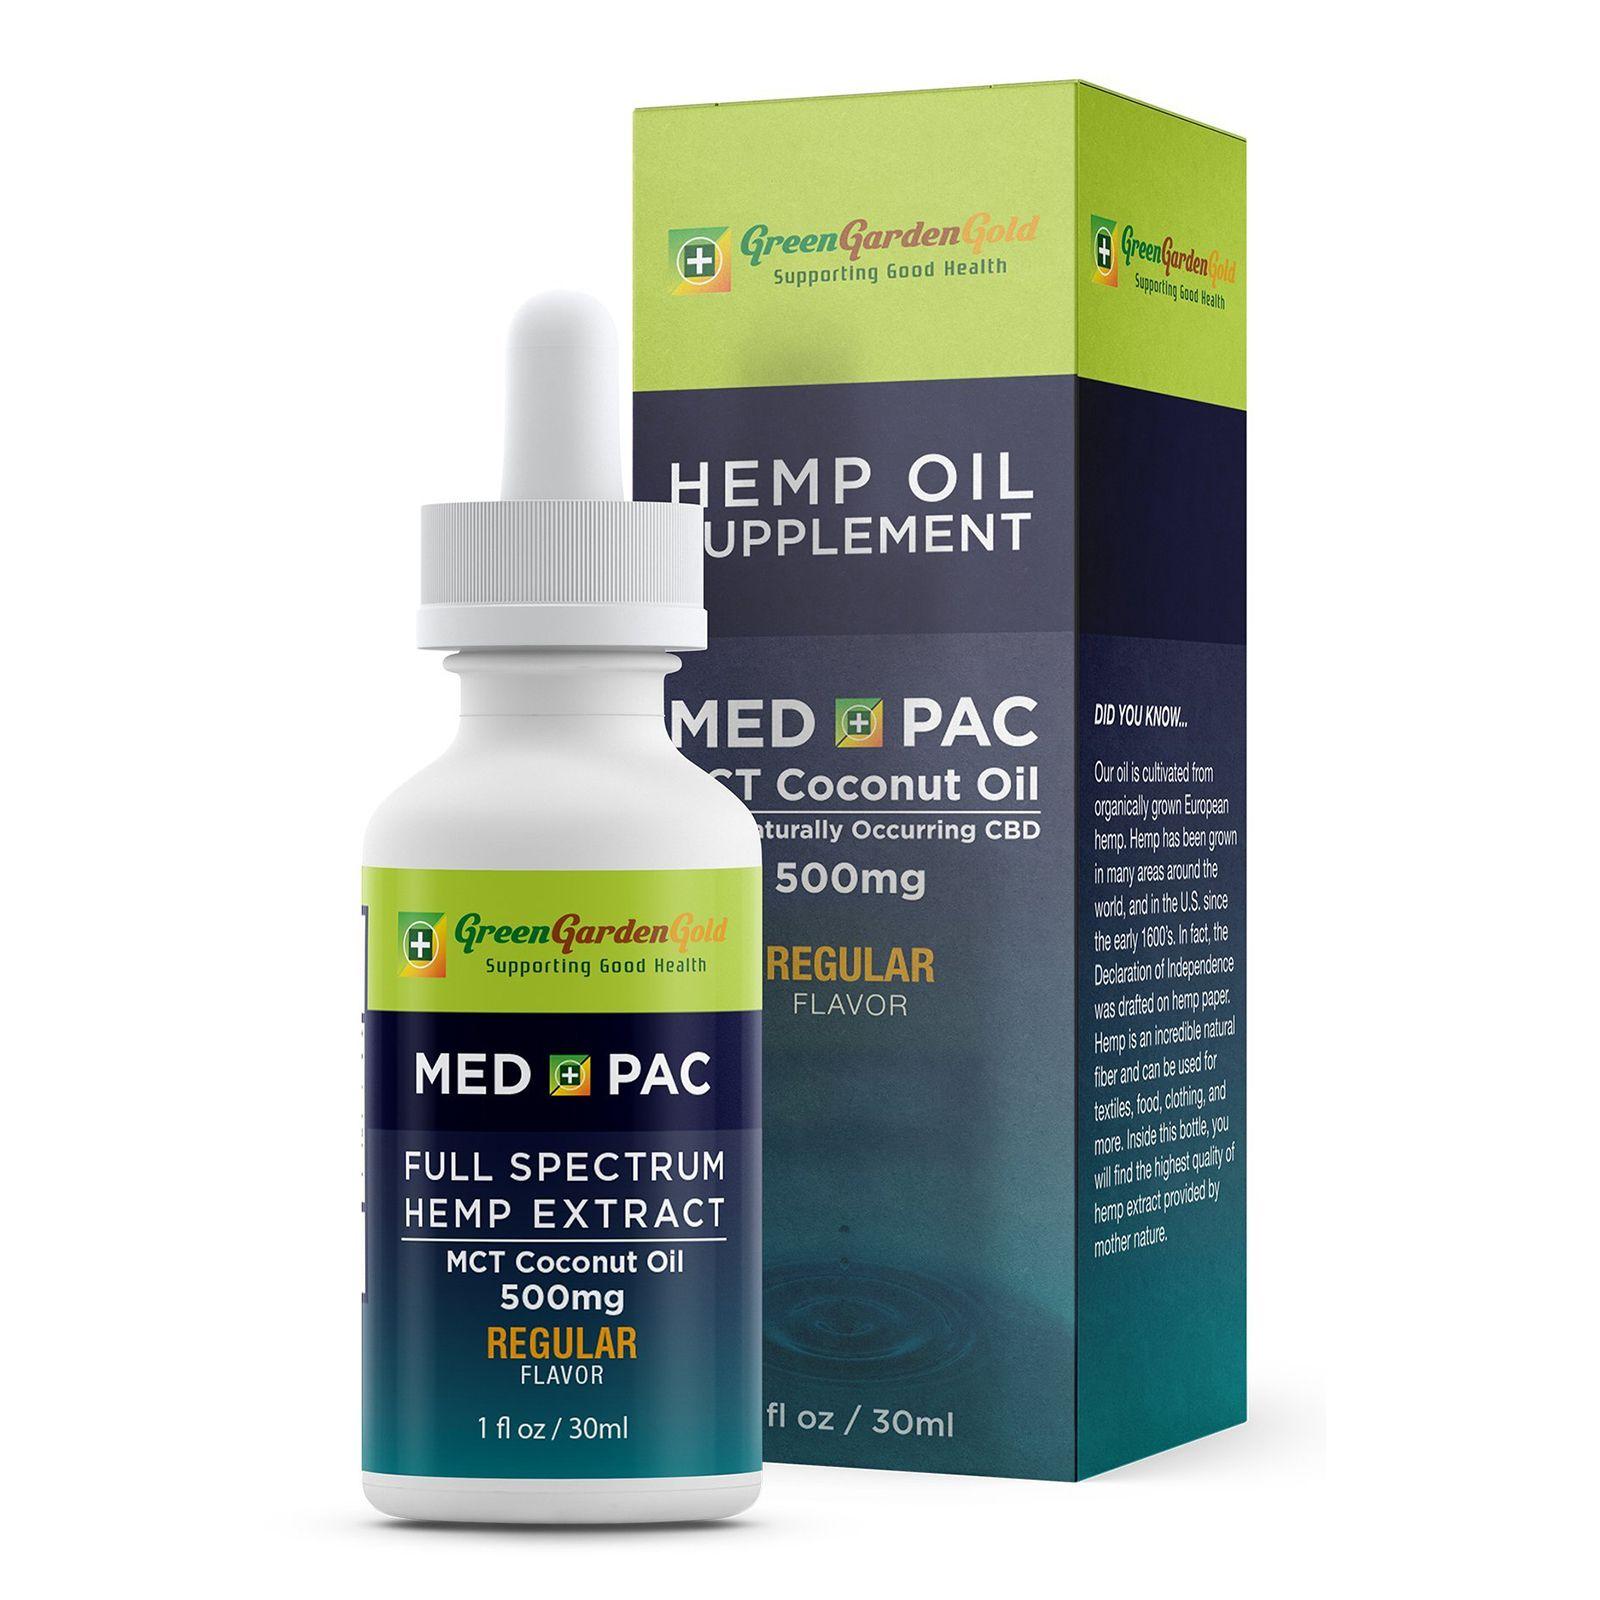 Med Pac CBD Oil Natural Flavor 500 mg 1 fl. oz. (30 mL)